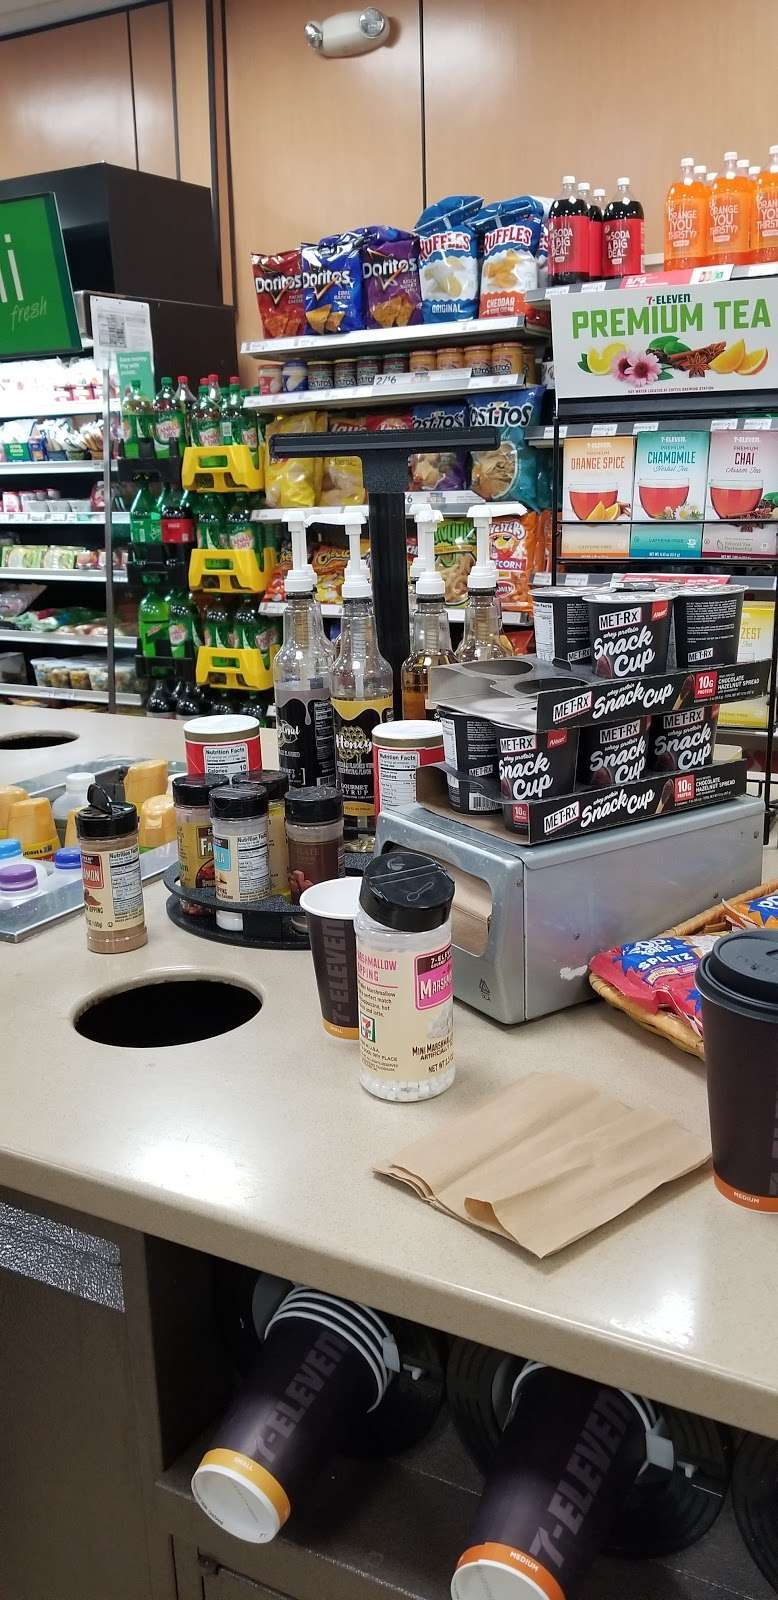 7-Eleven - convenience store  | Photo 5 of 10 | Address: 1189 Route 9 North, Old Bridge Township, NJ 08857, USA | Phone: (732) 727-0407